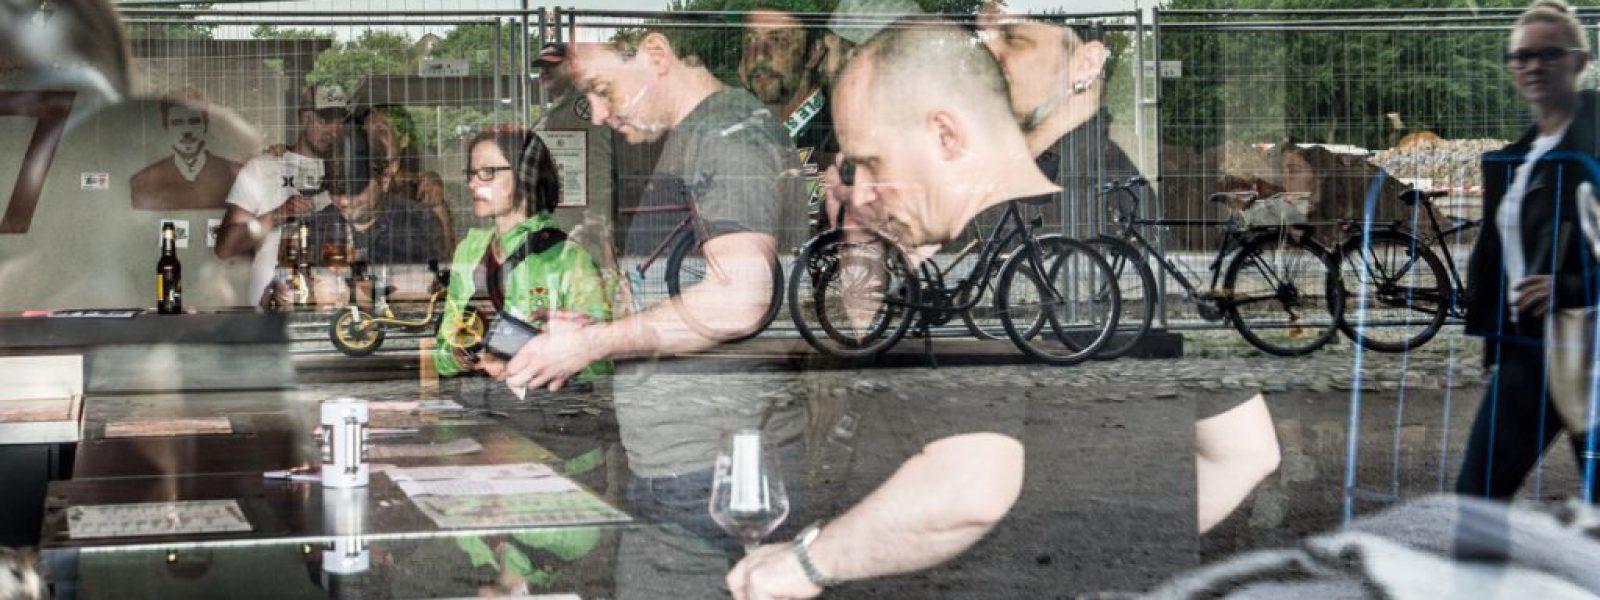 Weinfest gegen Rassismus (Fotos Sabrina Adeline Nagel) - 22